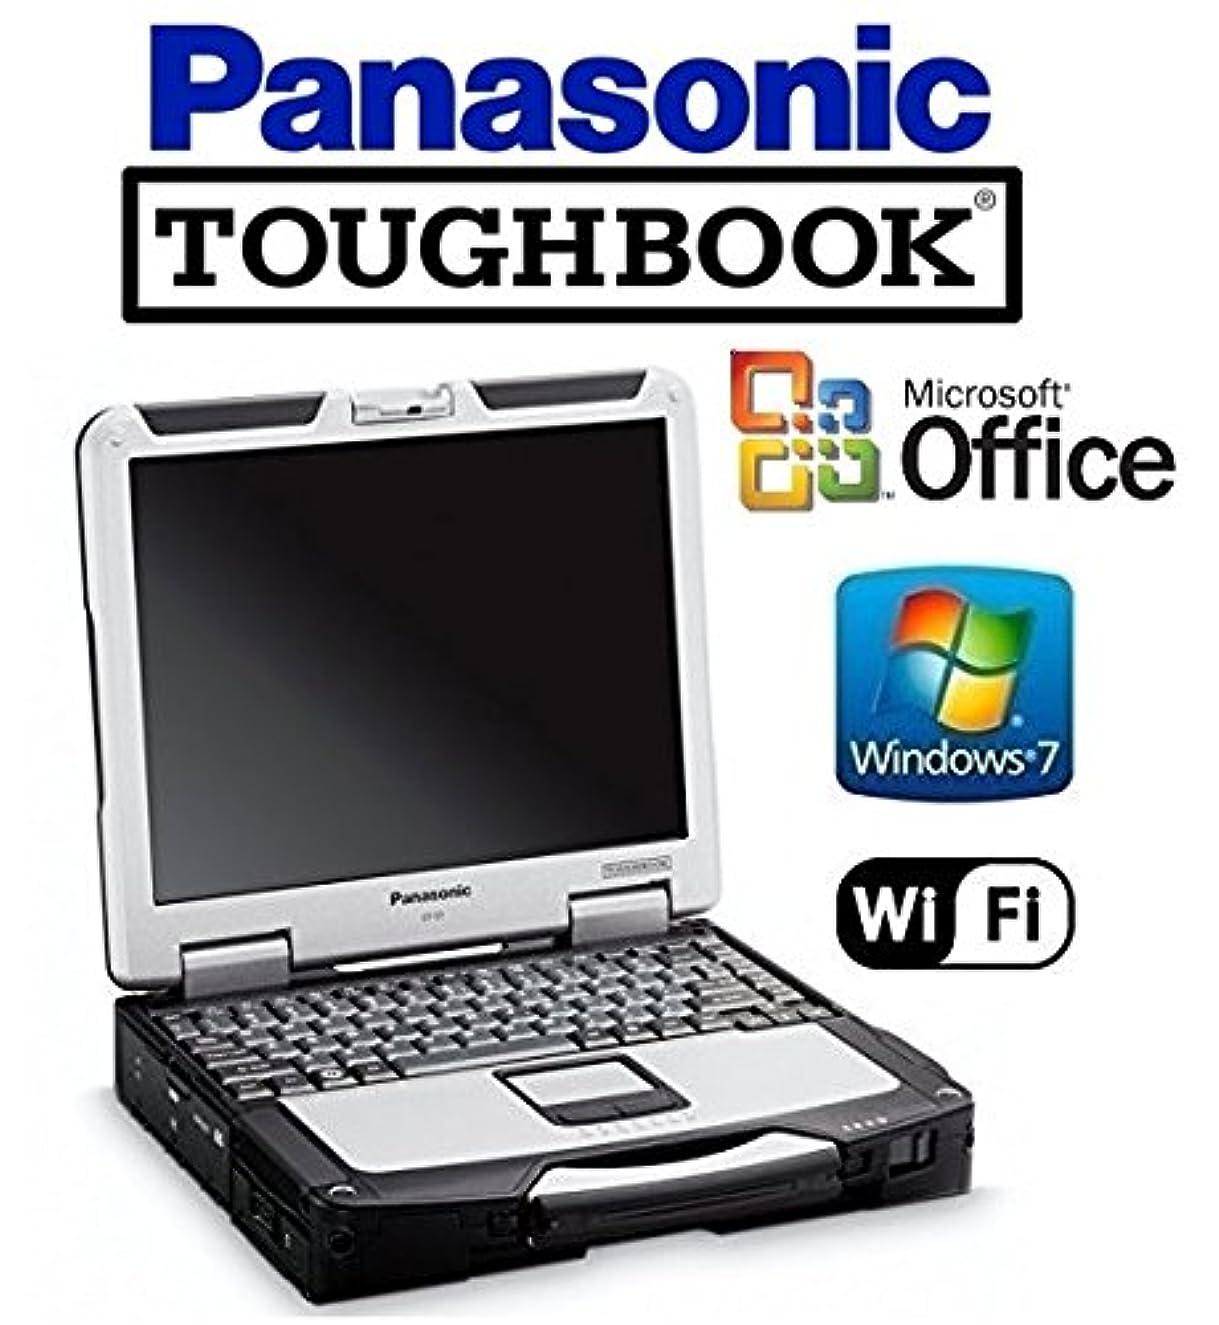 Sturdy Panasonic CF-31 Toughbook Laptop - Intel Core i5-2540M 2.6GHz - New 256GB SSD - 16GB DDR3 RAM - 13.1